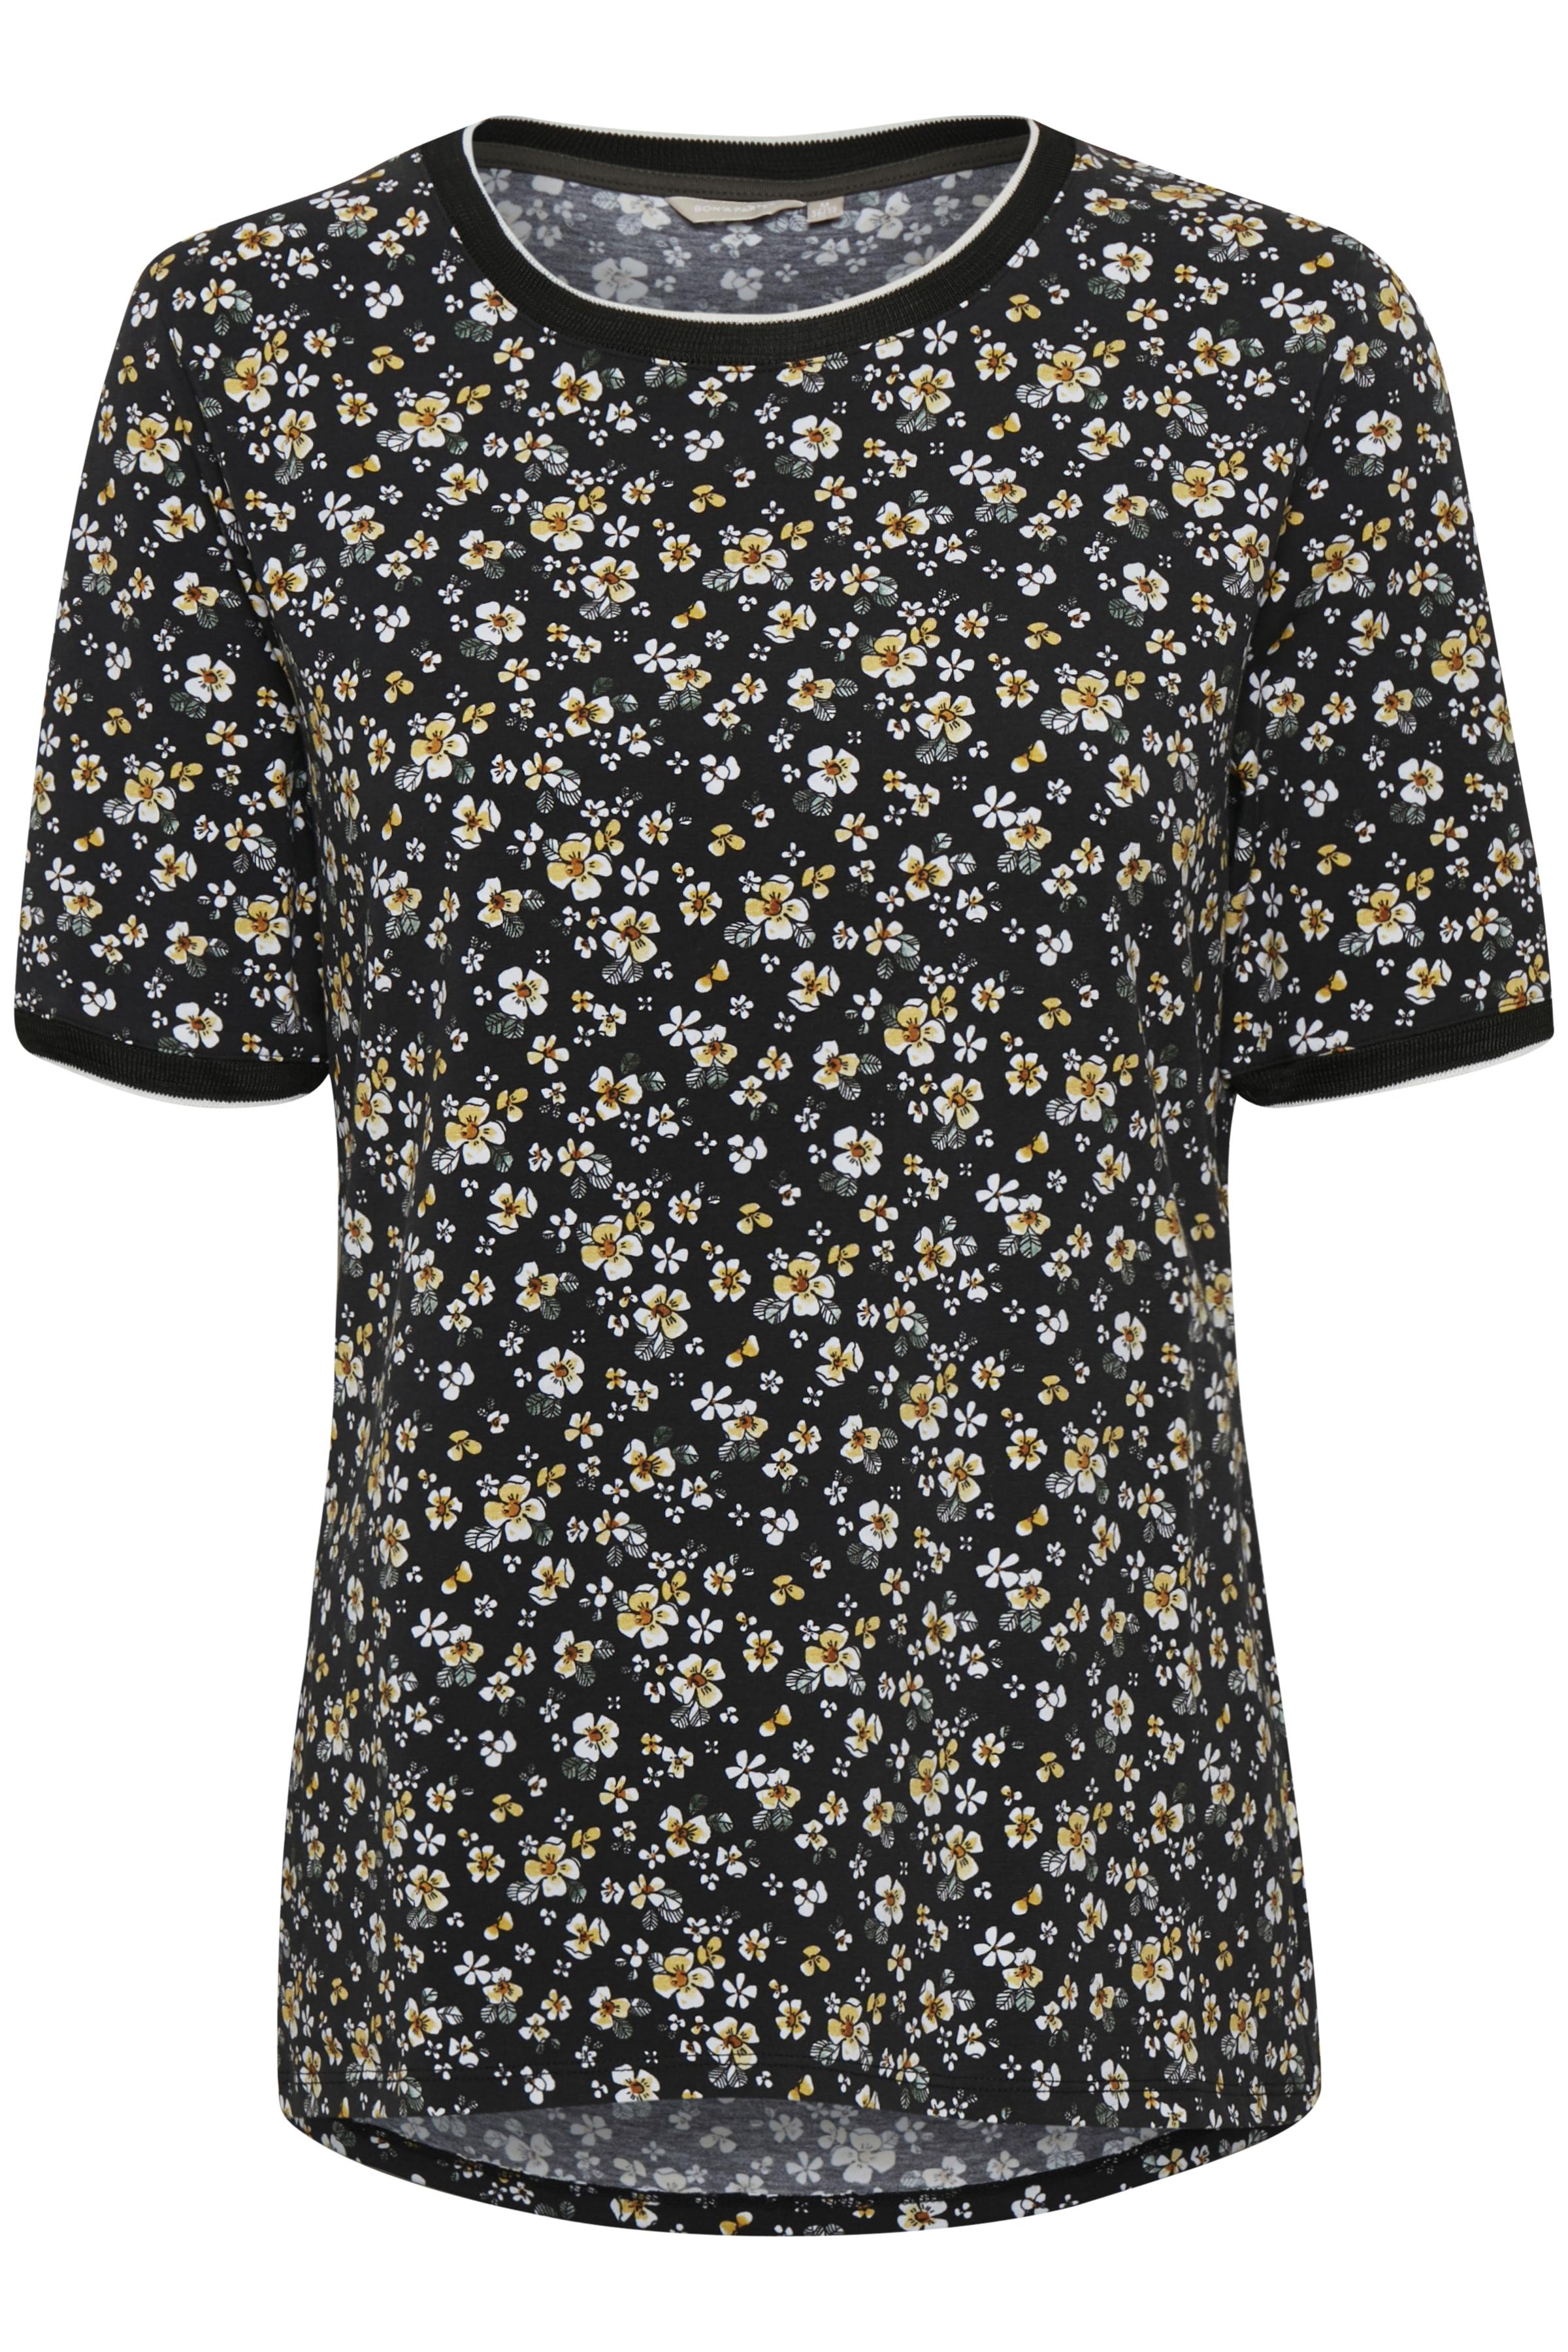 Image of BonA Parte Dame T-shirt - Sort/lys gul